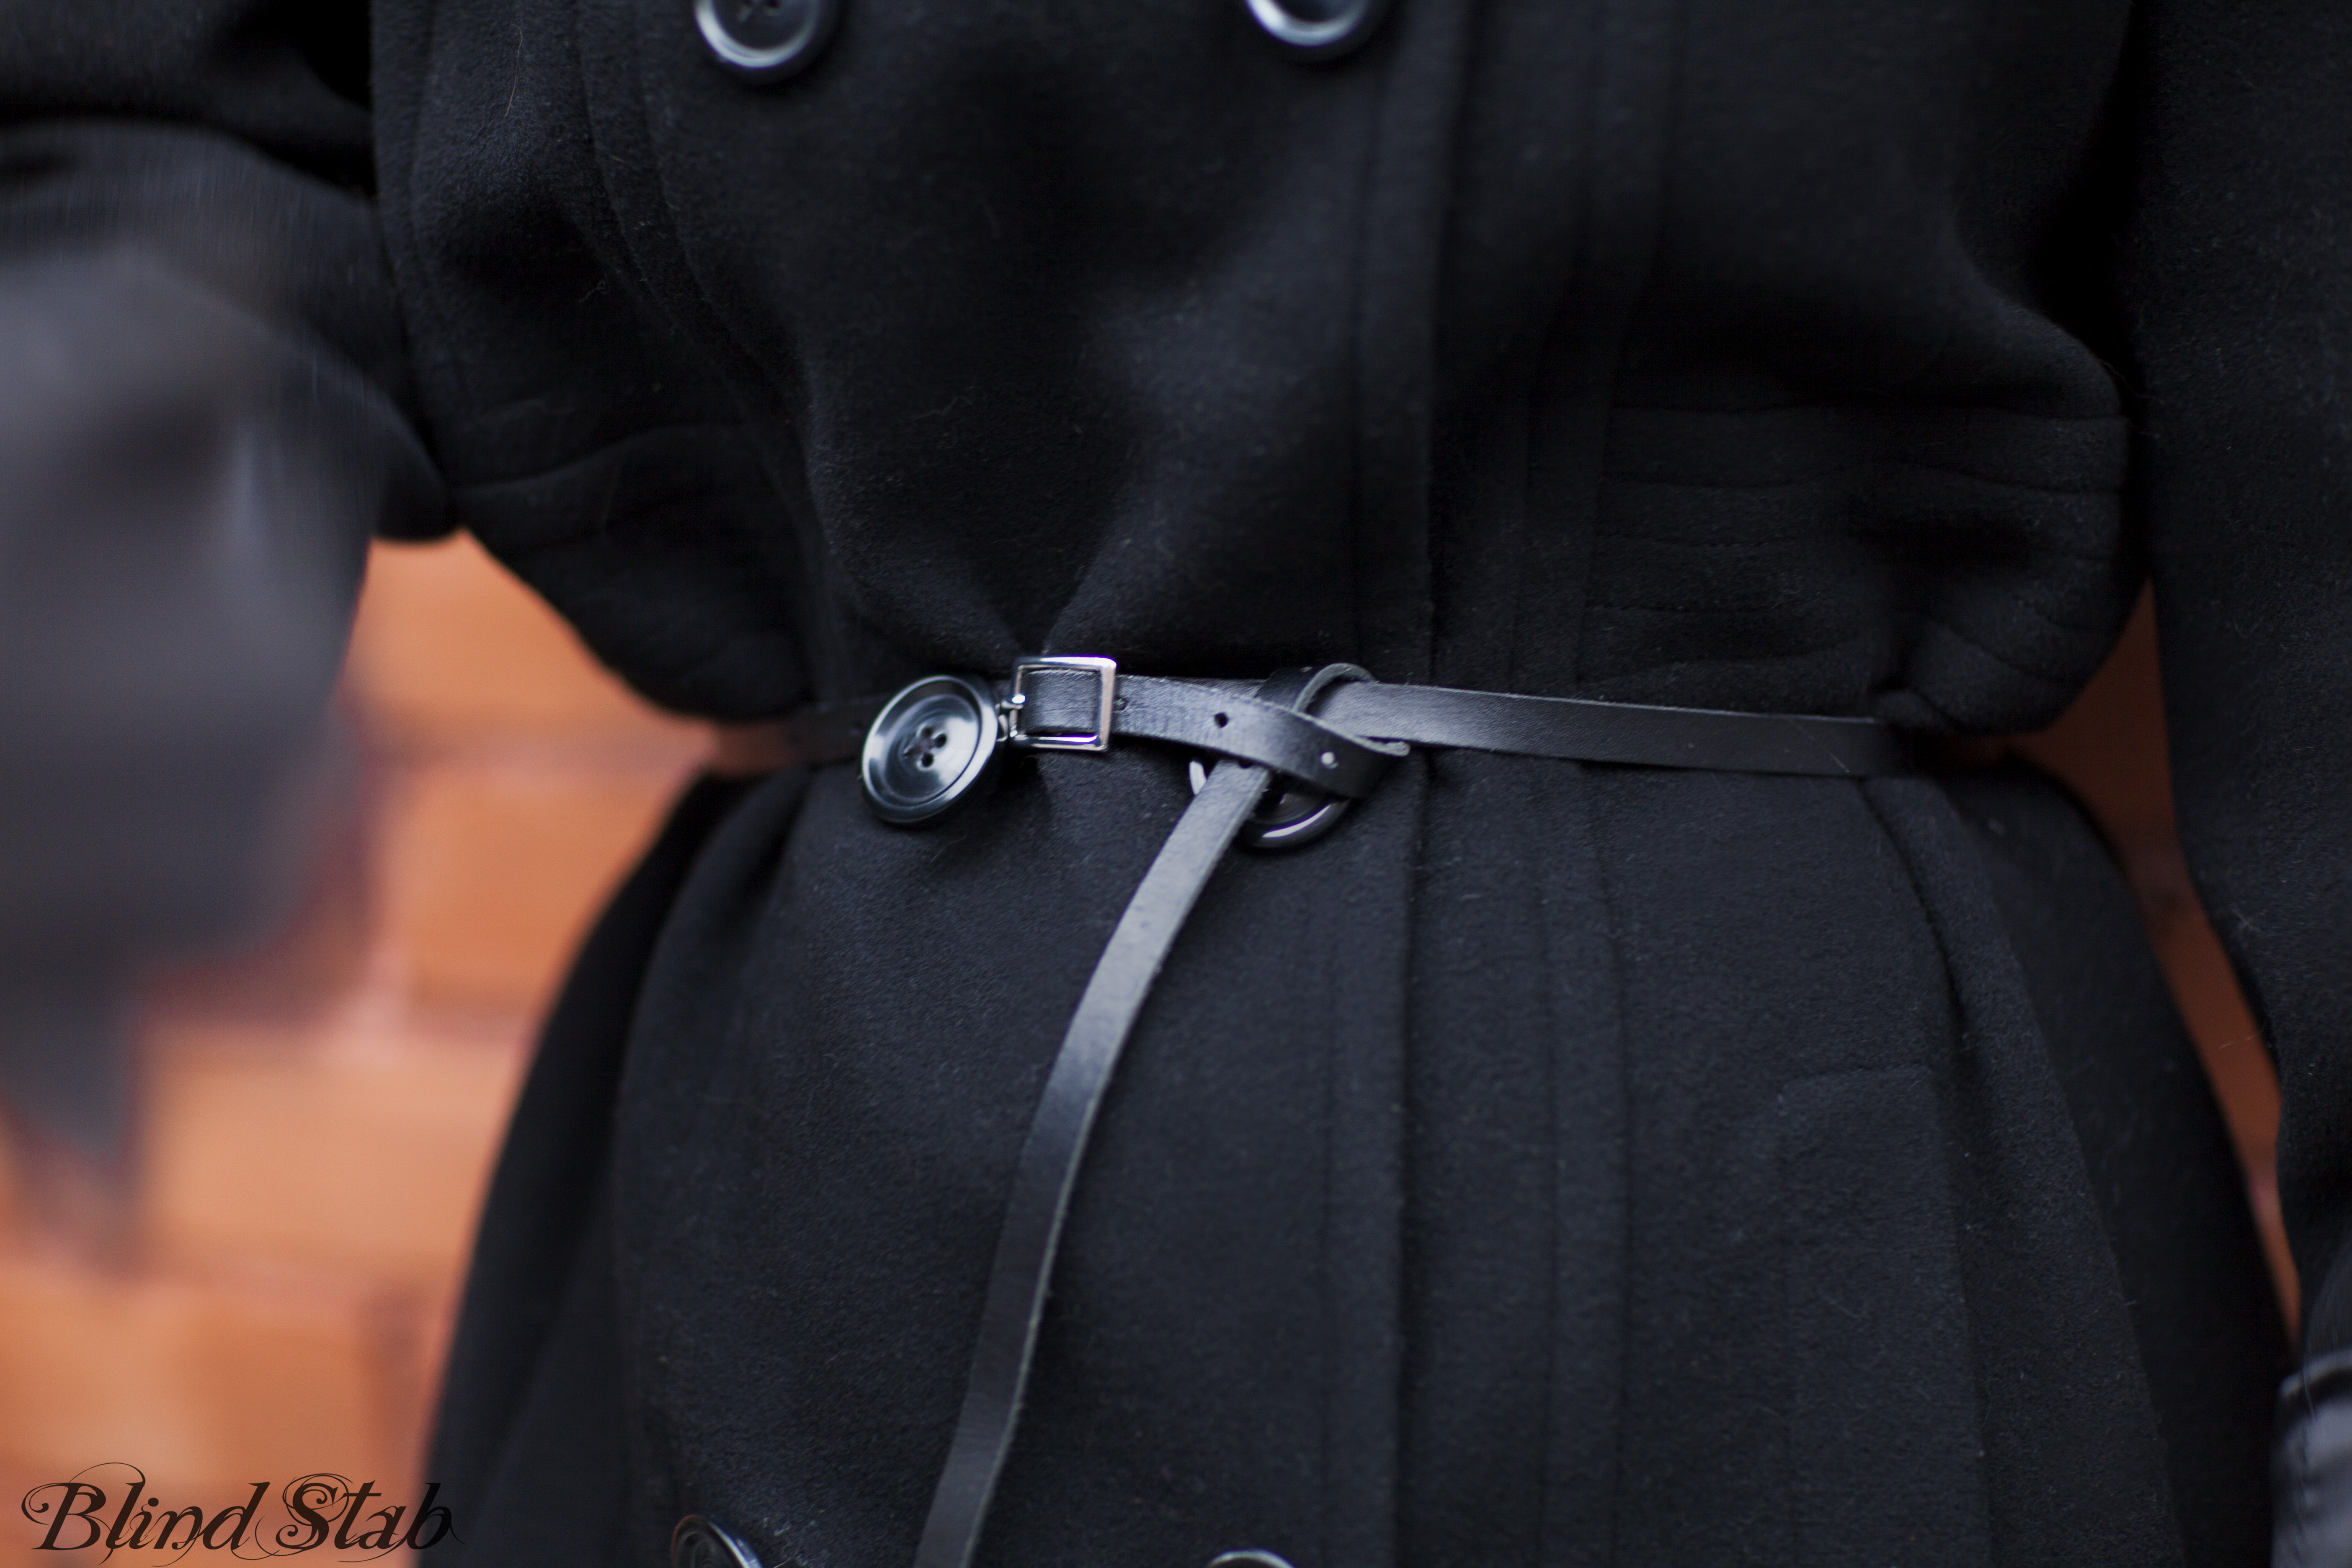 Maison-Martin-Margiela-H&M-Black-Skinny-Belt